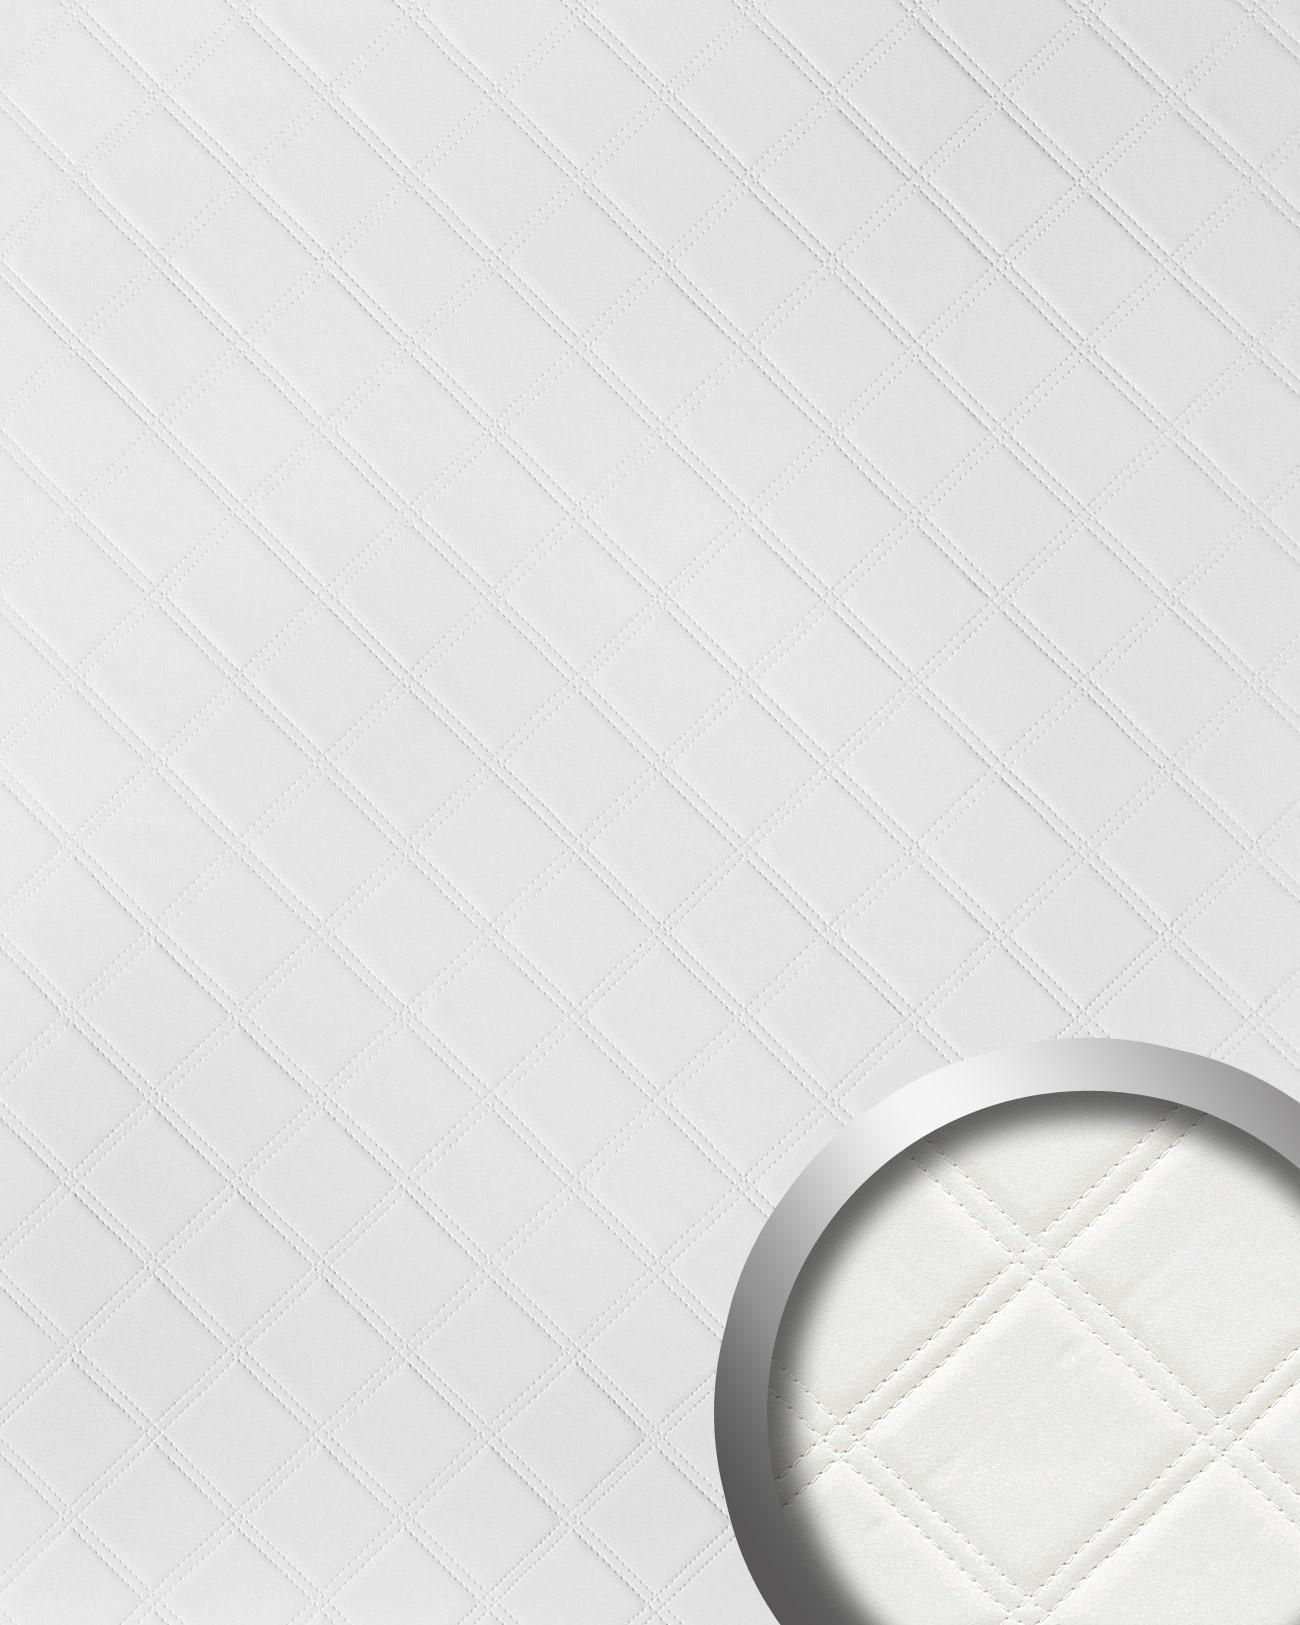 wandpaneel karo leder 3d luxus wallface 15042 rombo blickfang dekor selbstklebende tapete. Black Bedroom Furniture Sets. Home Design Ideas